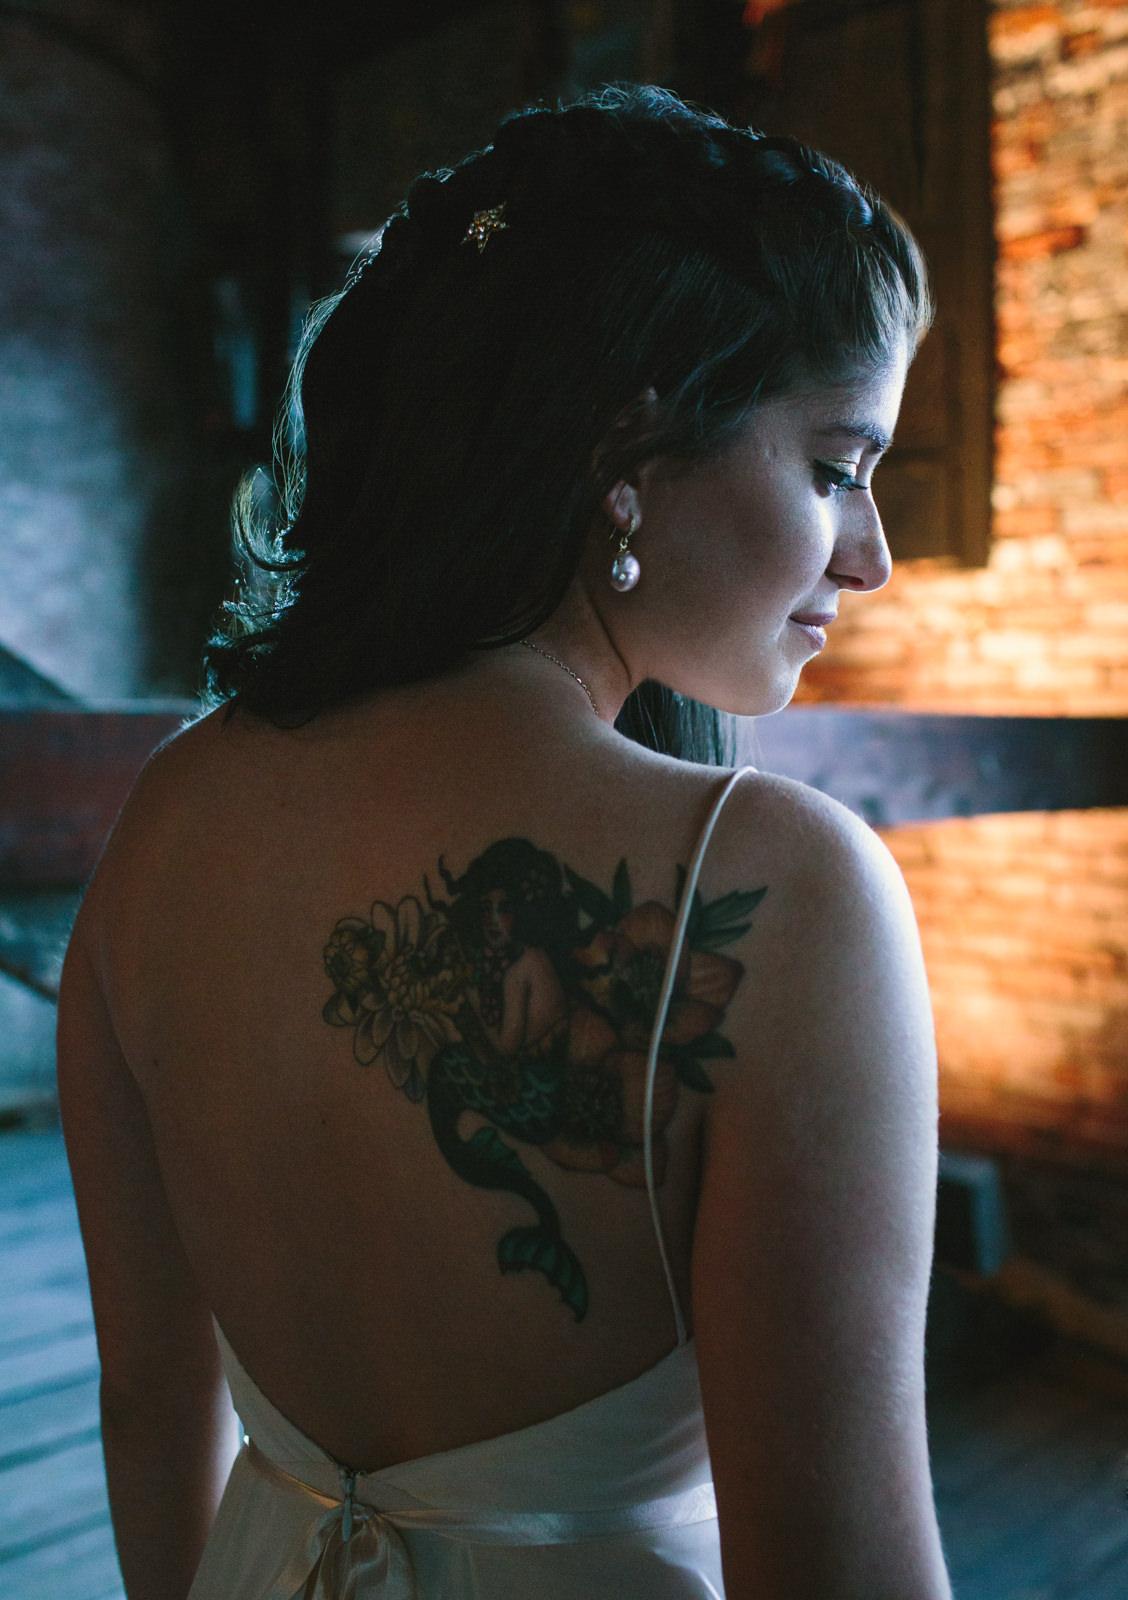 beautiful tattoed bride in portland, maine